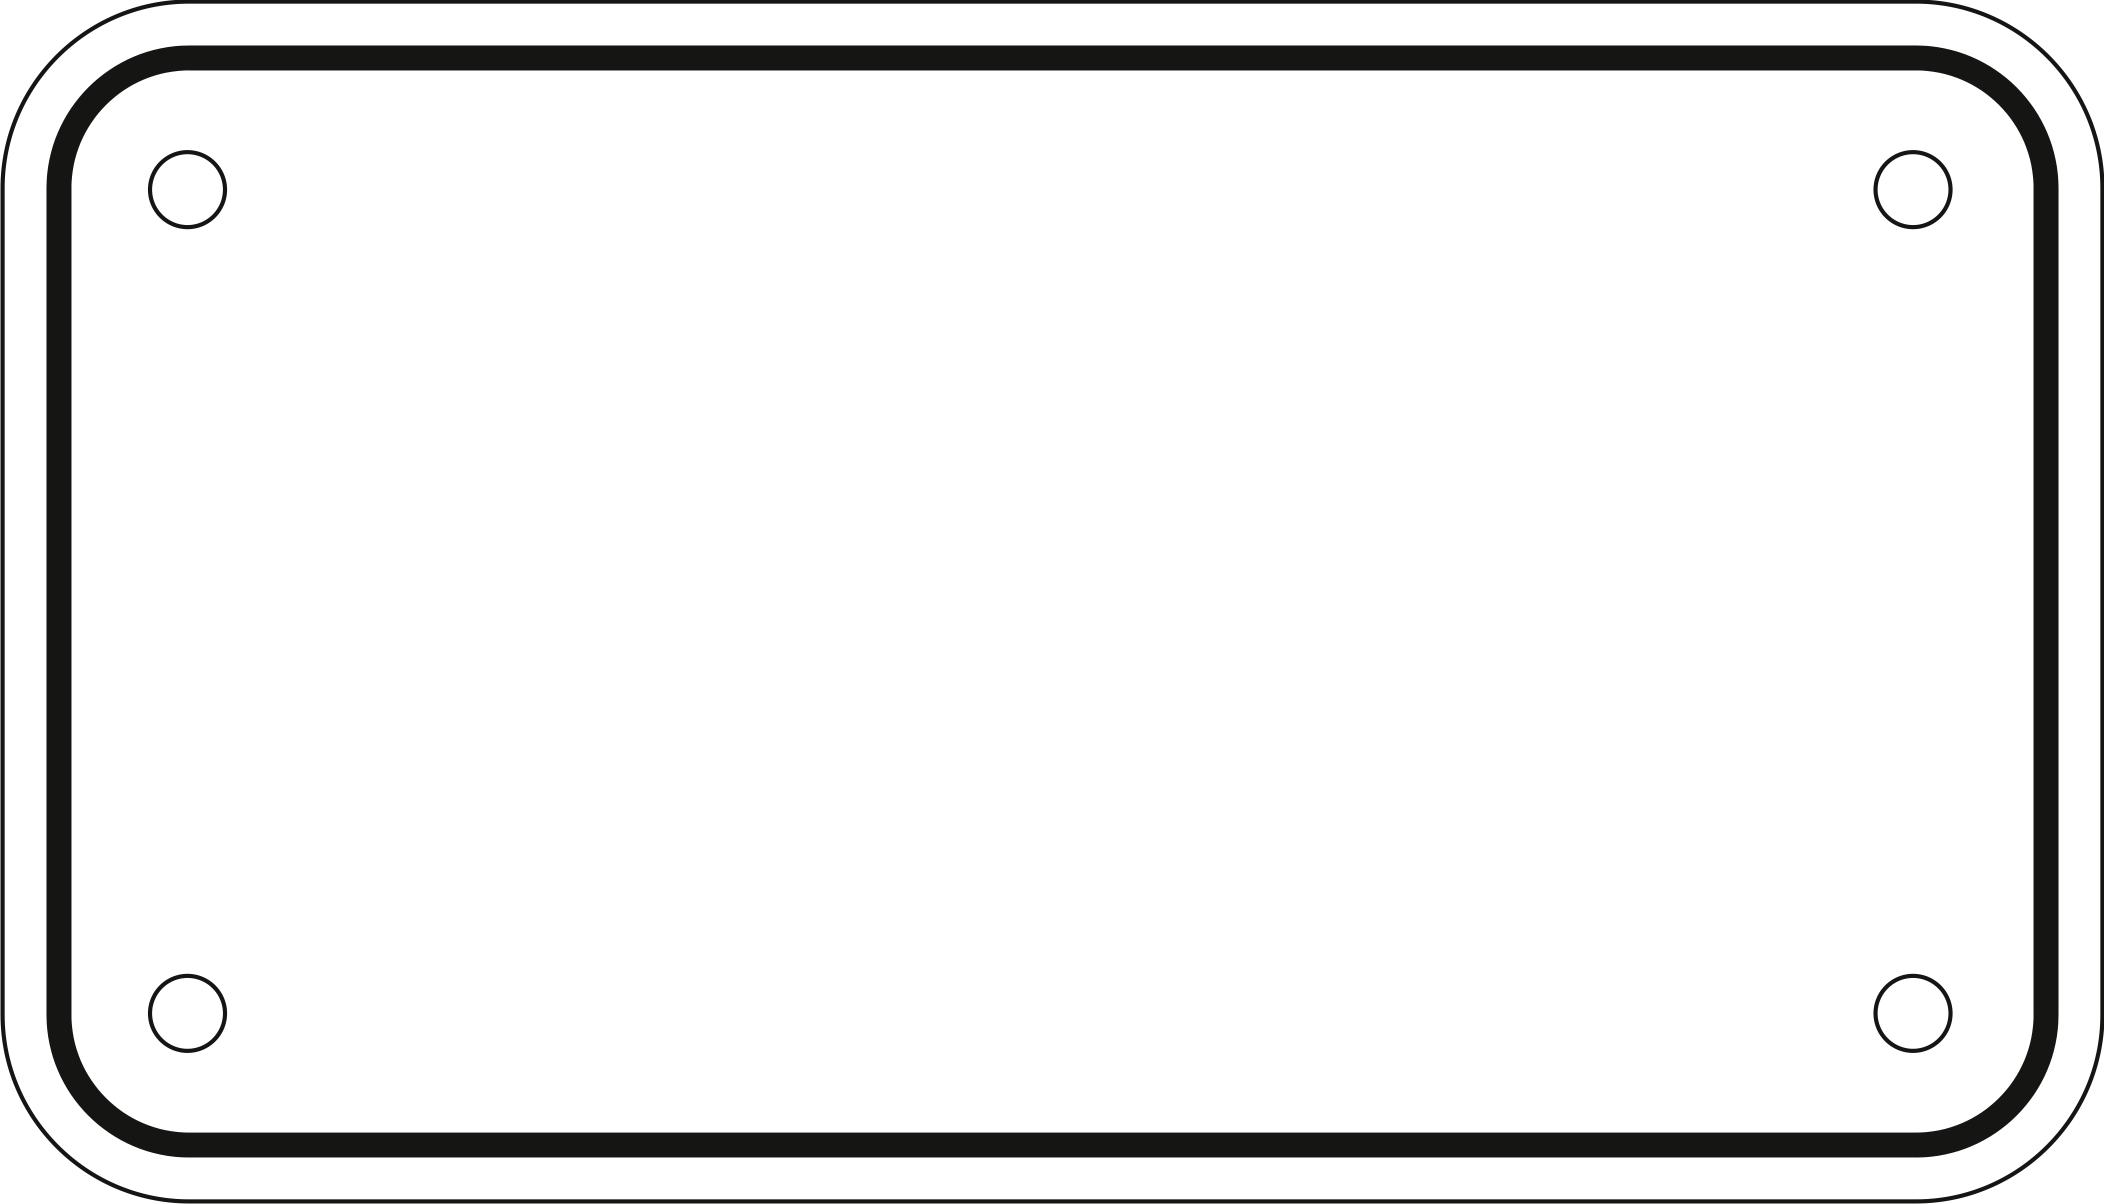 License Plate Template Vector at GetDrawings.com.